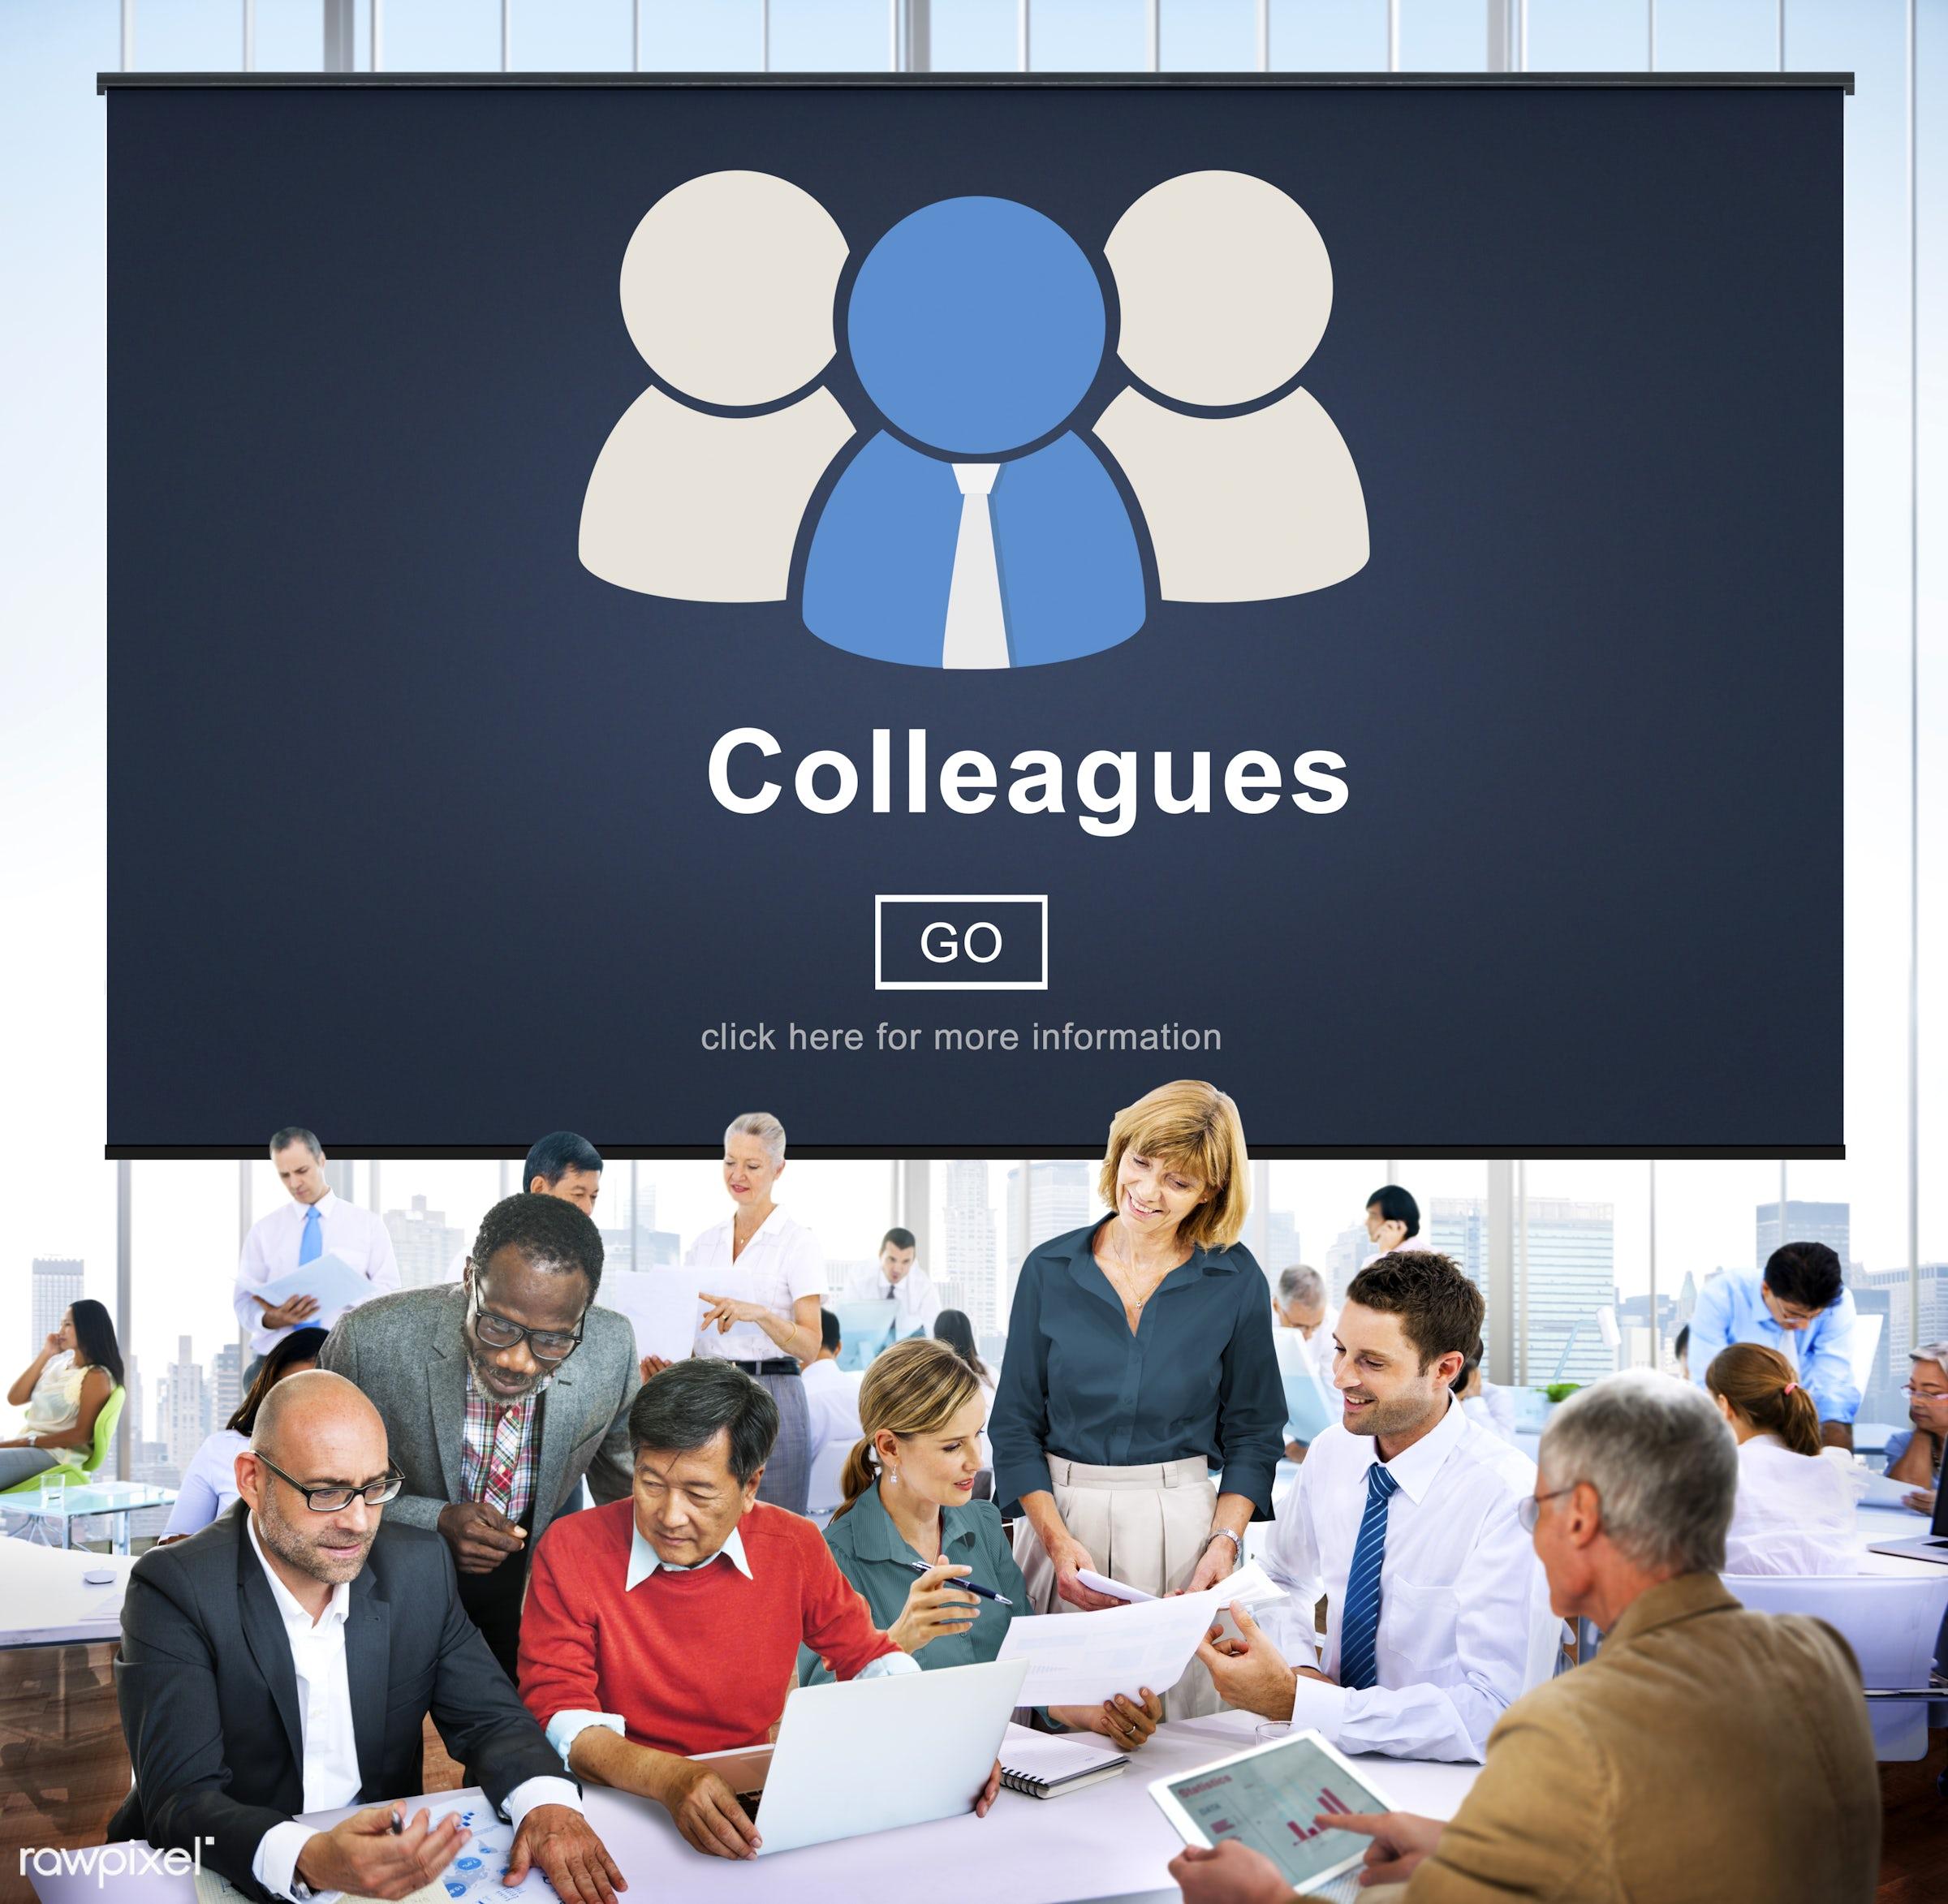 african descent, agreement, alliance, asian ethnicity, brainstorming, business, businessmen, businesswomen, collaborate,...